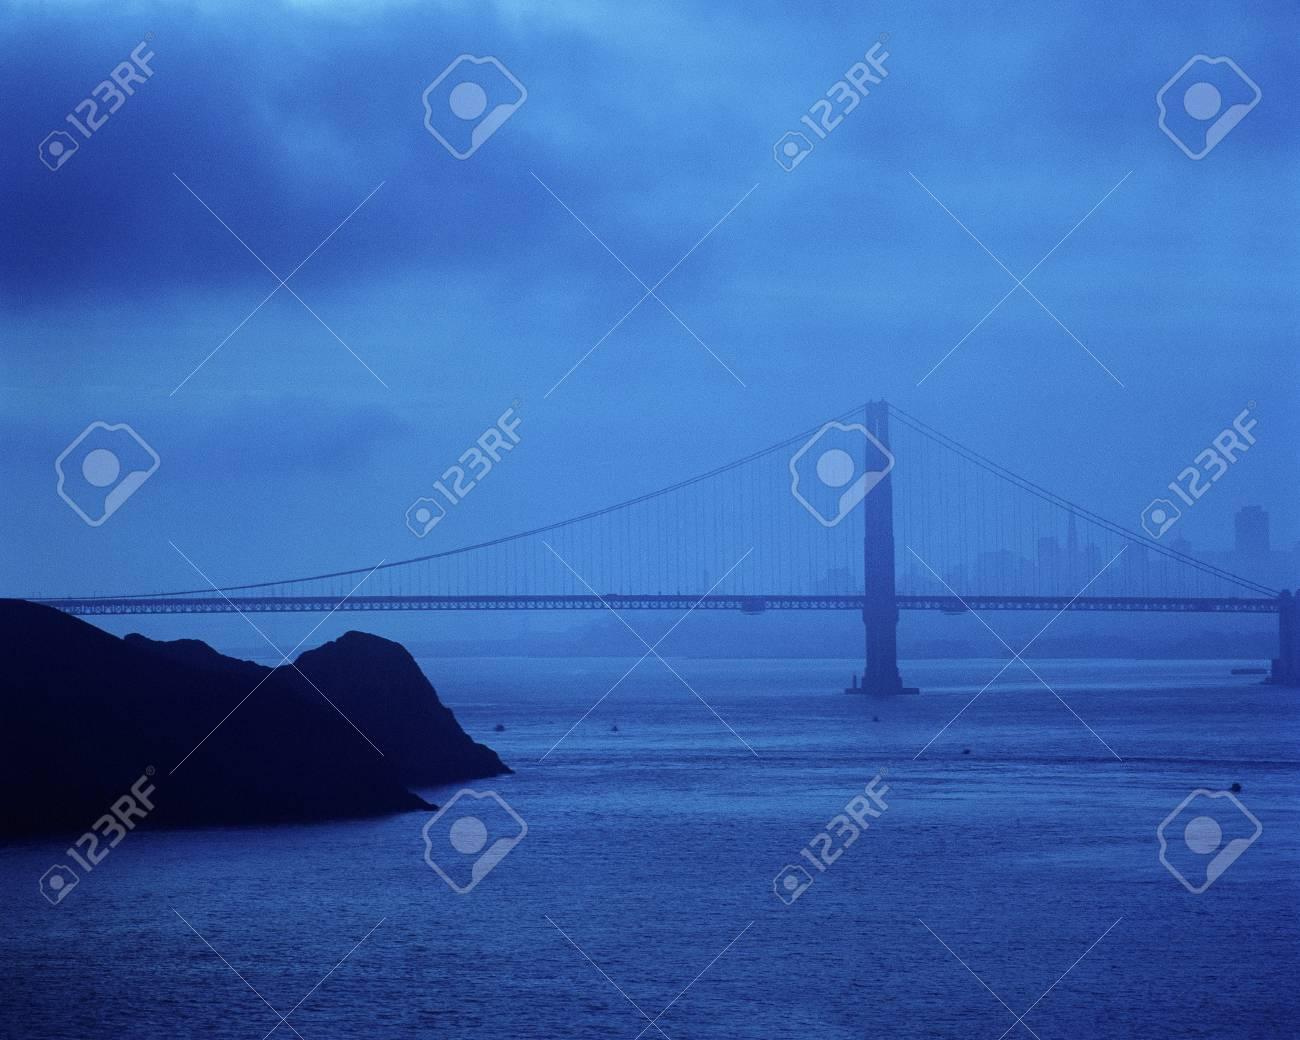 Evening falling on Golden Gate Bridge Stock Photo - 20487047